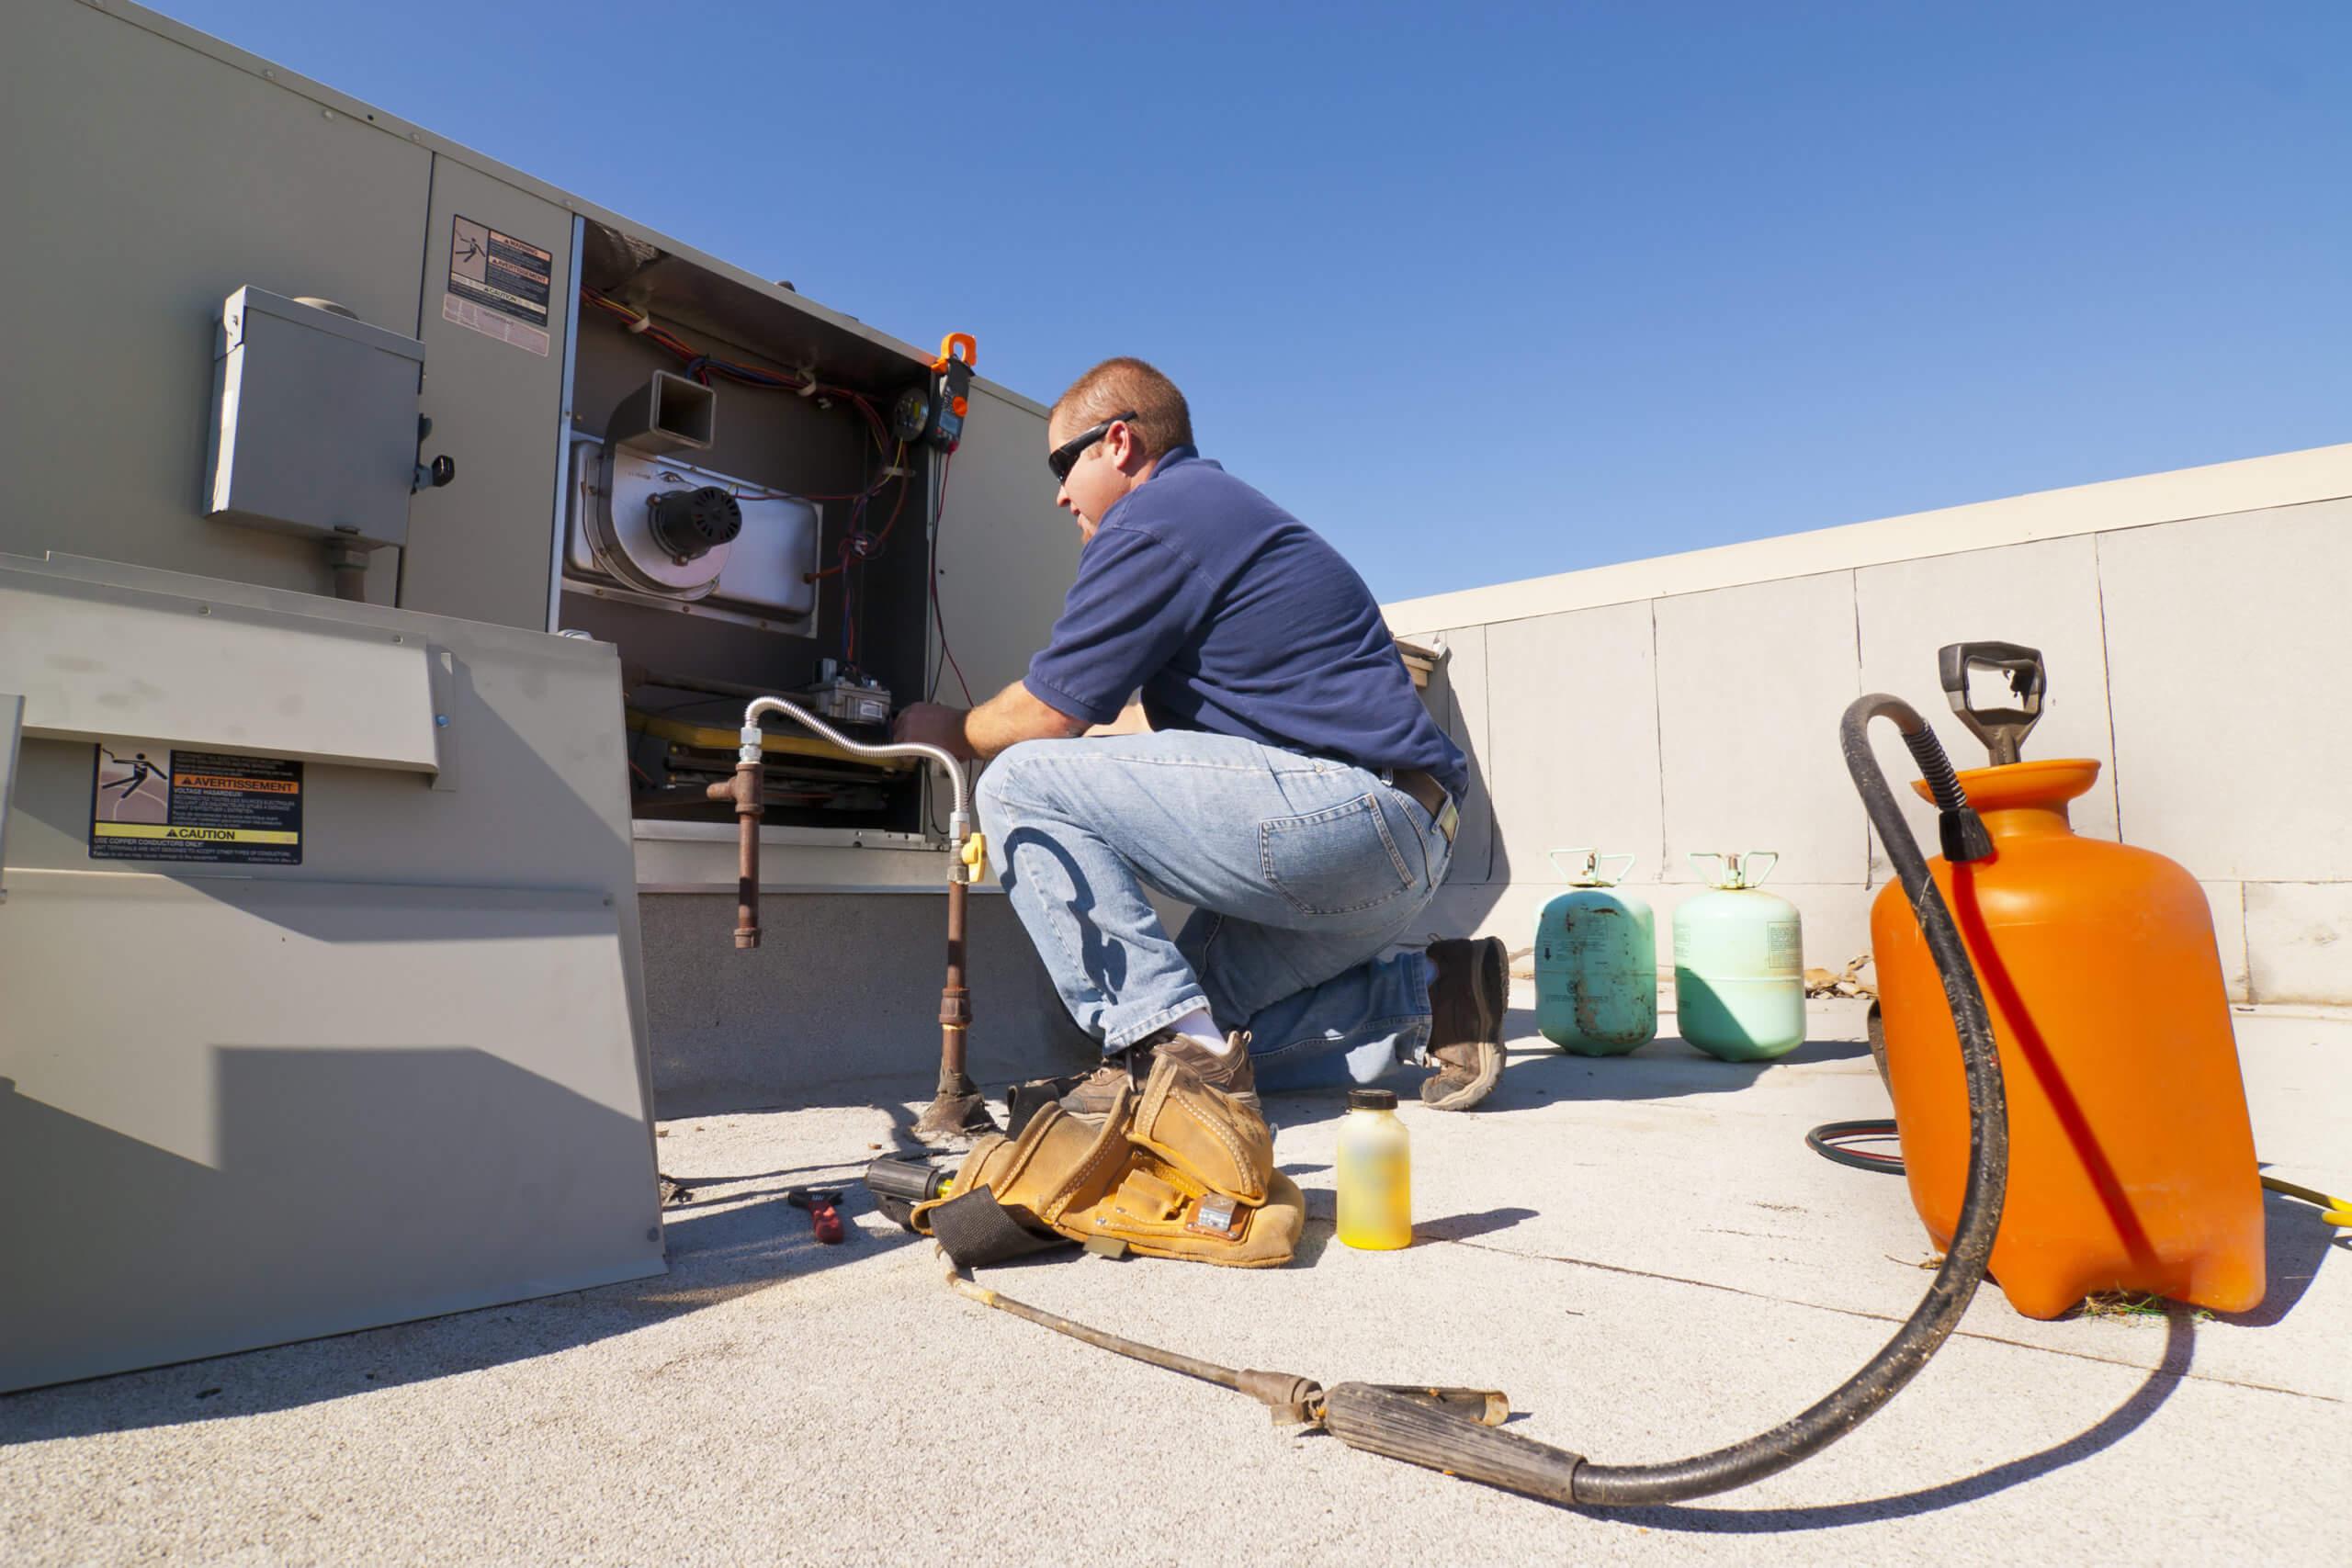 HVAC Technician Testing System ASHRAE Standard 211